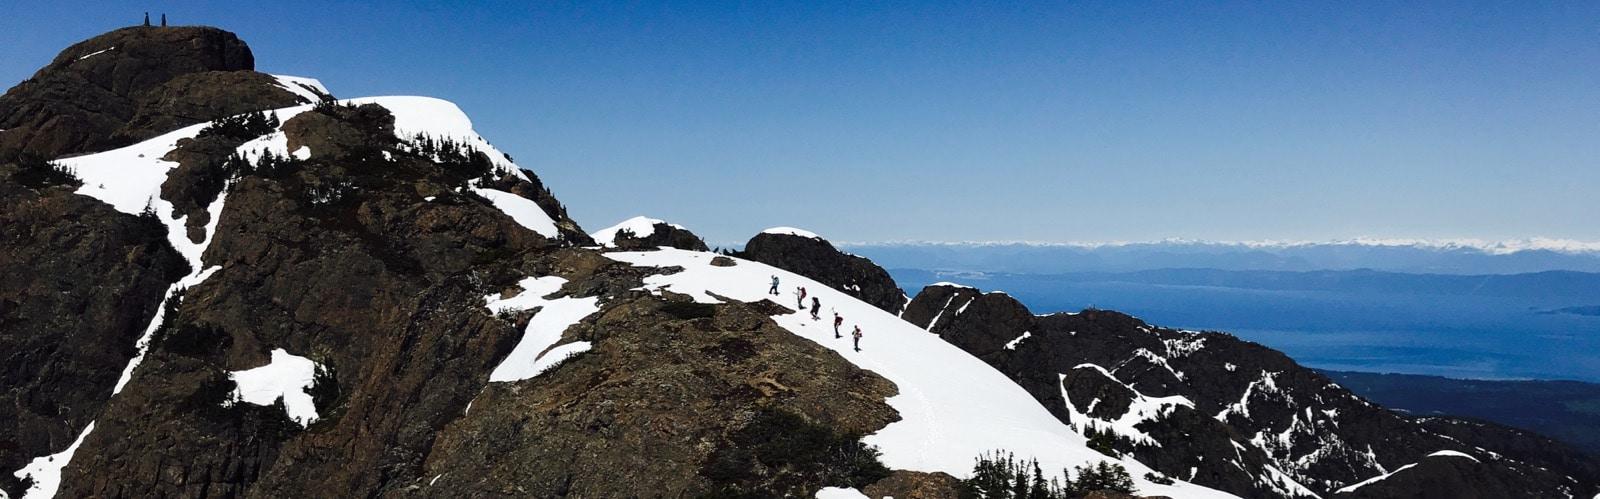 Mount Arrowsmith – A Coast Mountain Culture Story